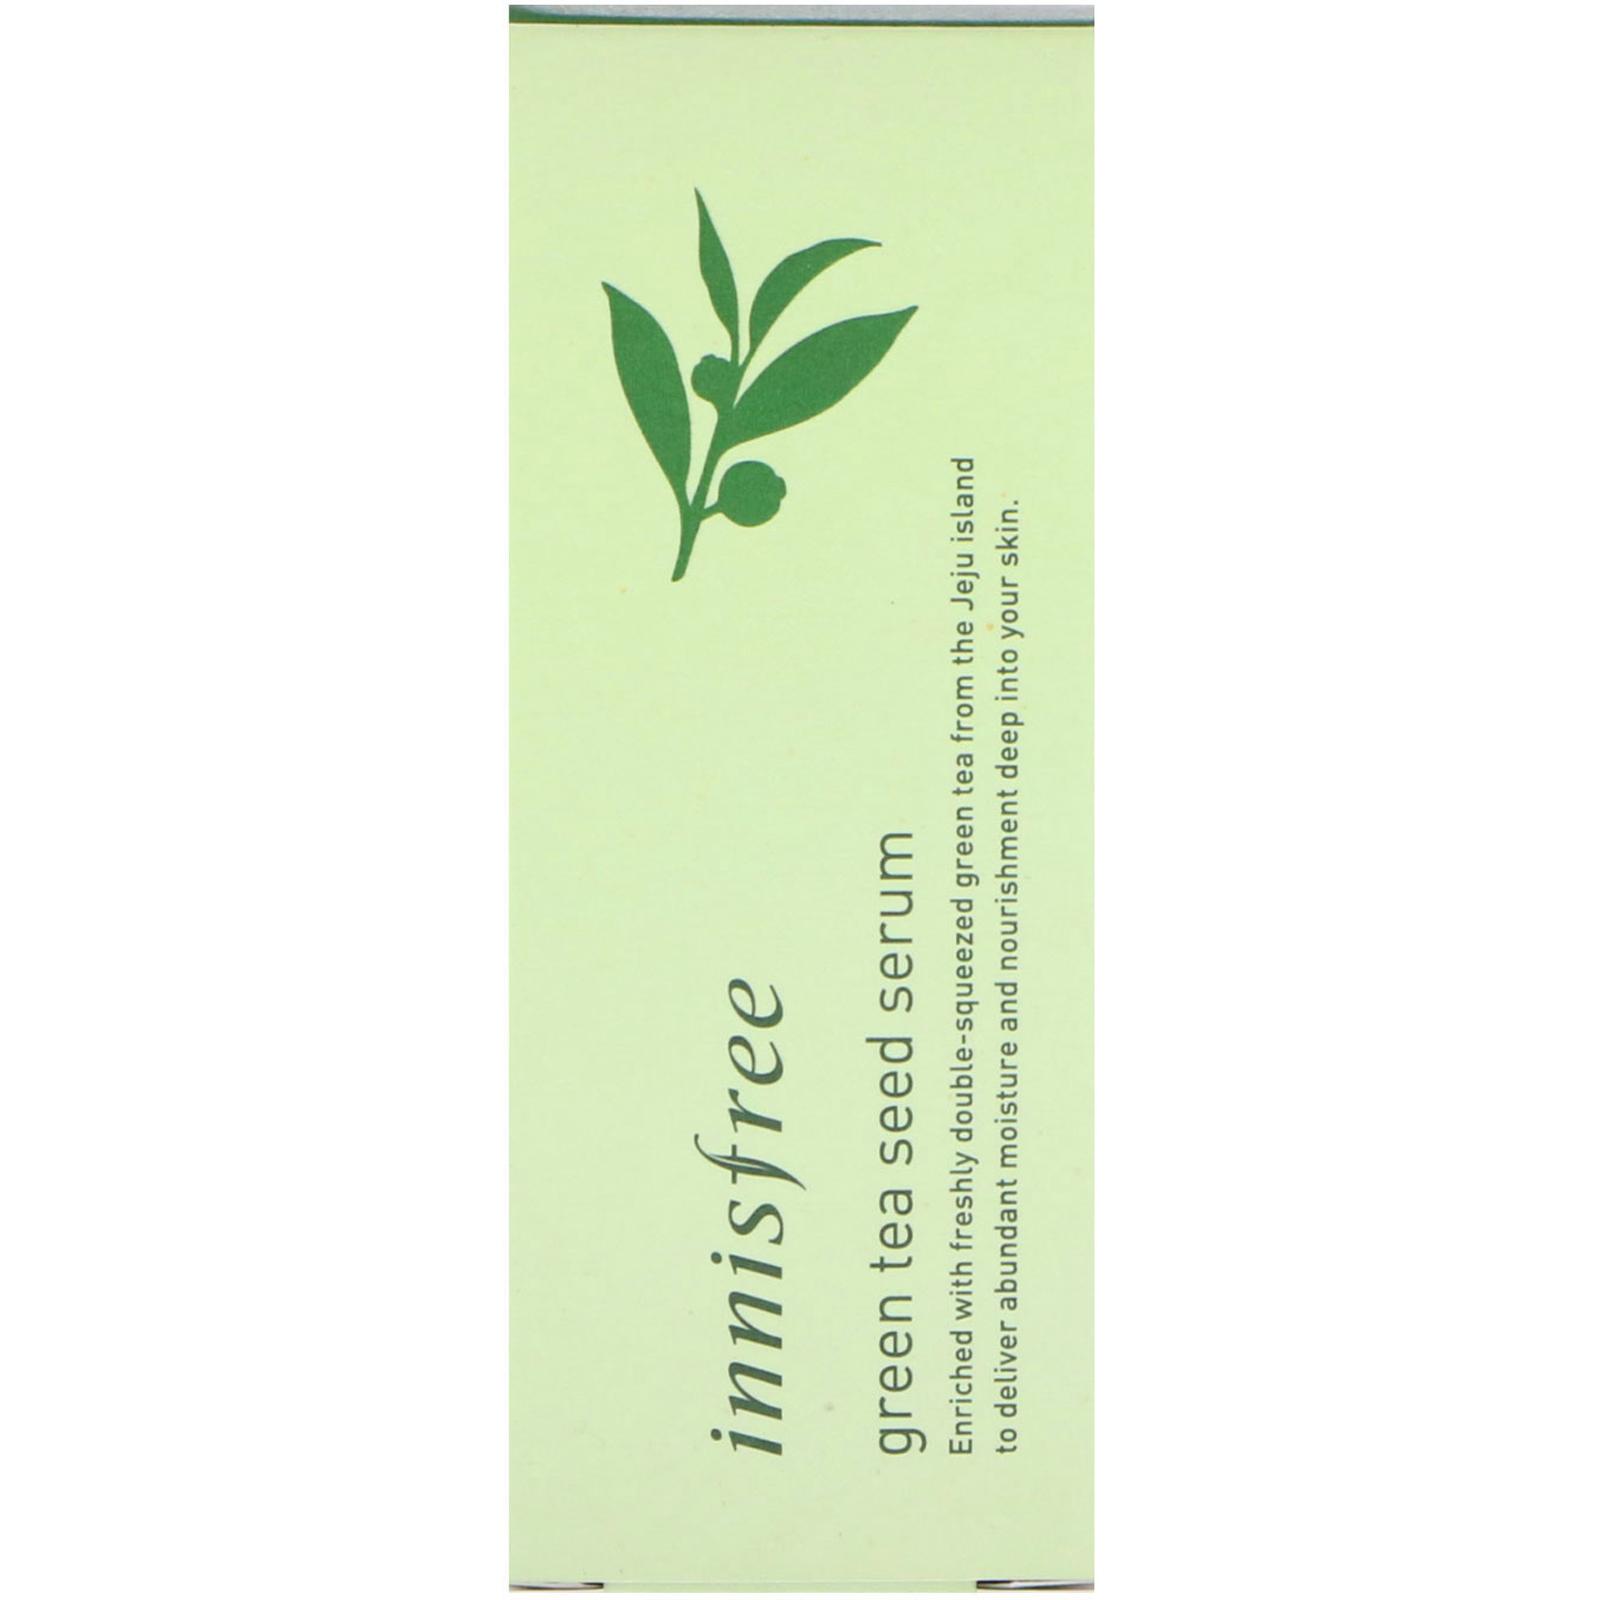 Innisfree Green Tea Seed Serum 80 Ml The 80ml